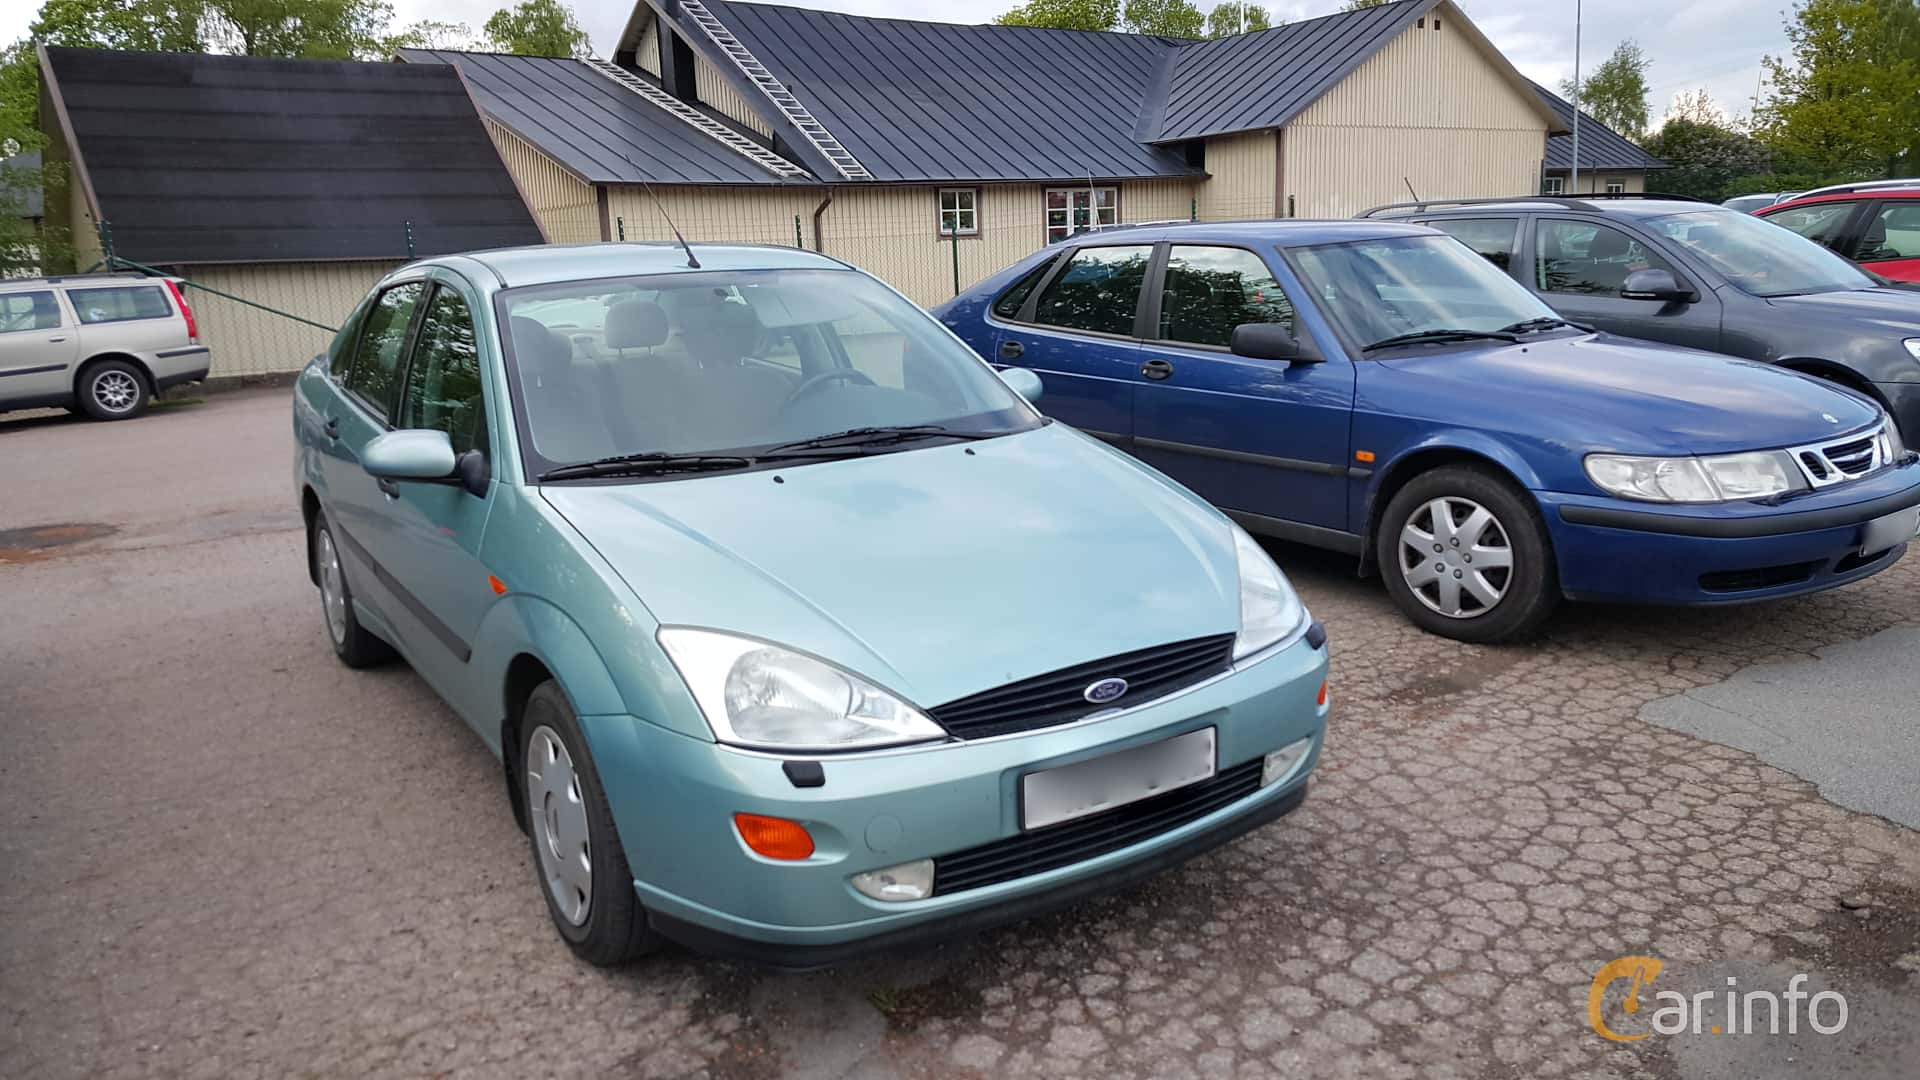 4 Images Of Ford Focus Sedan 20 Manual 130hp 2000 By Jonasbonde Se Front Side 130ps